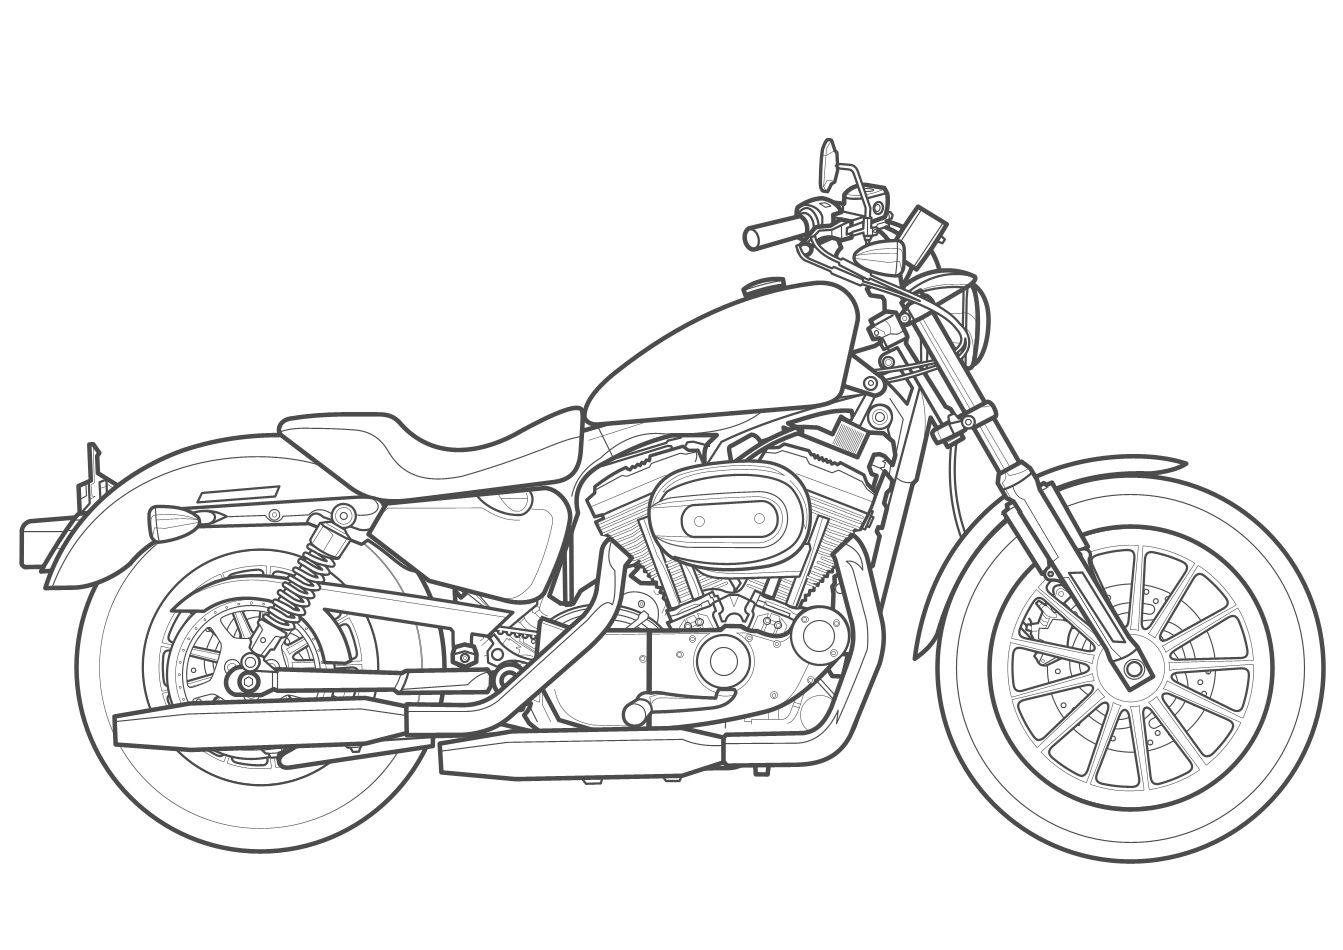 Line Drawing Of Harley Davidson